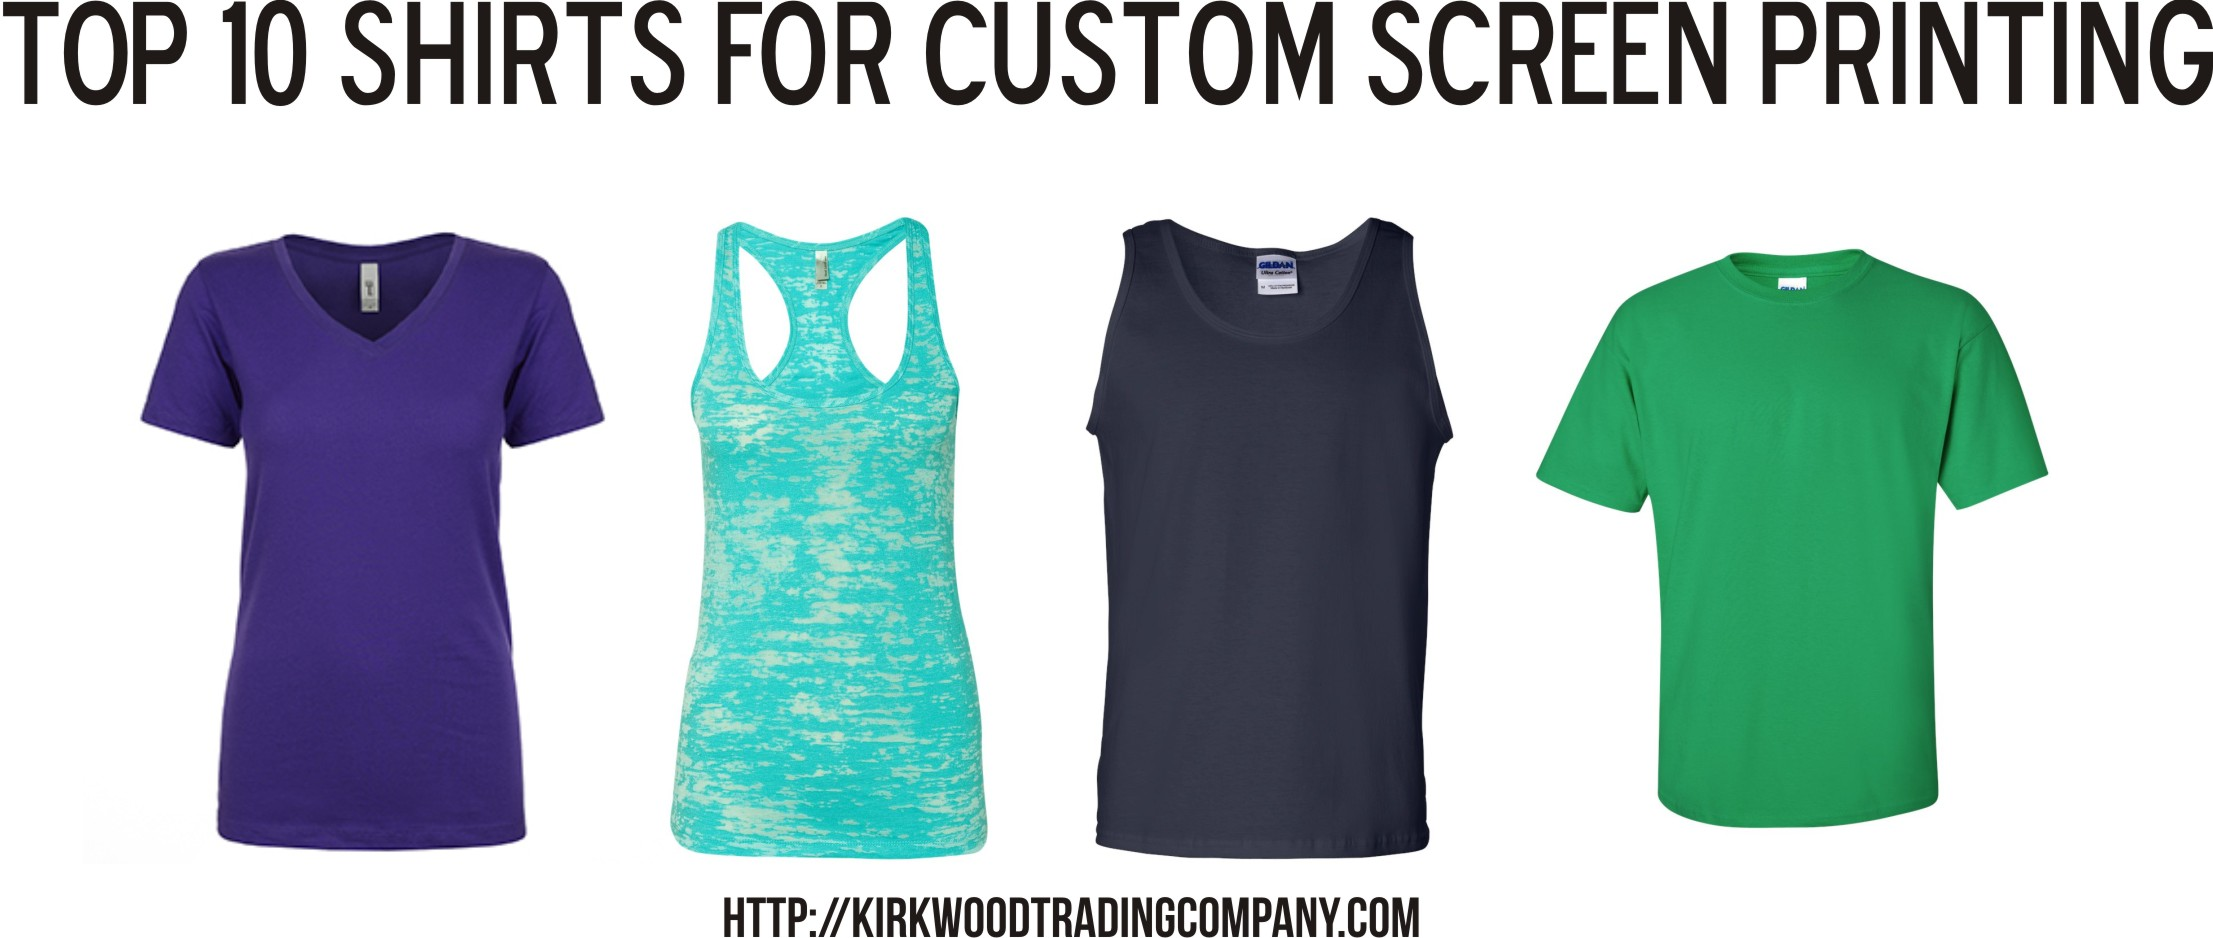 Top 10 Shirts For Custom Screen Printing Kirkwood Trading